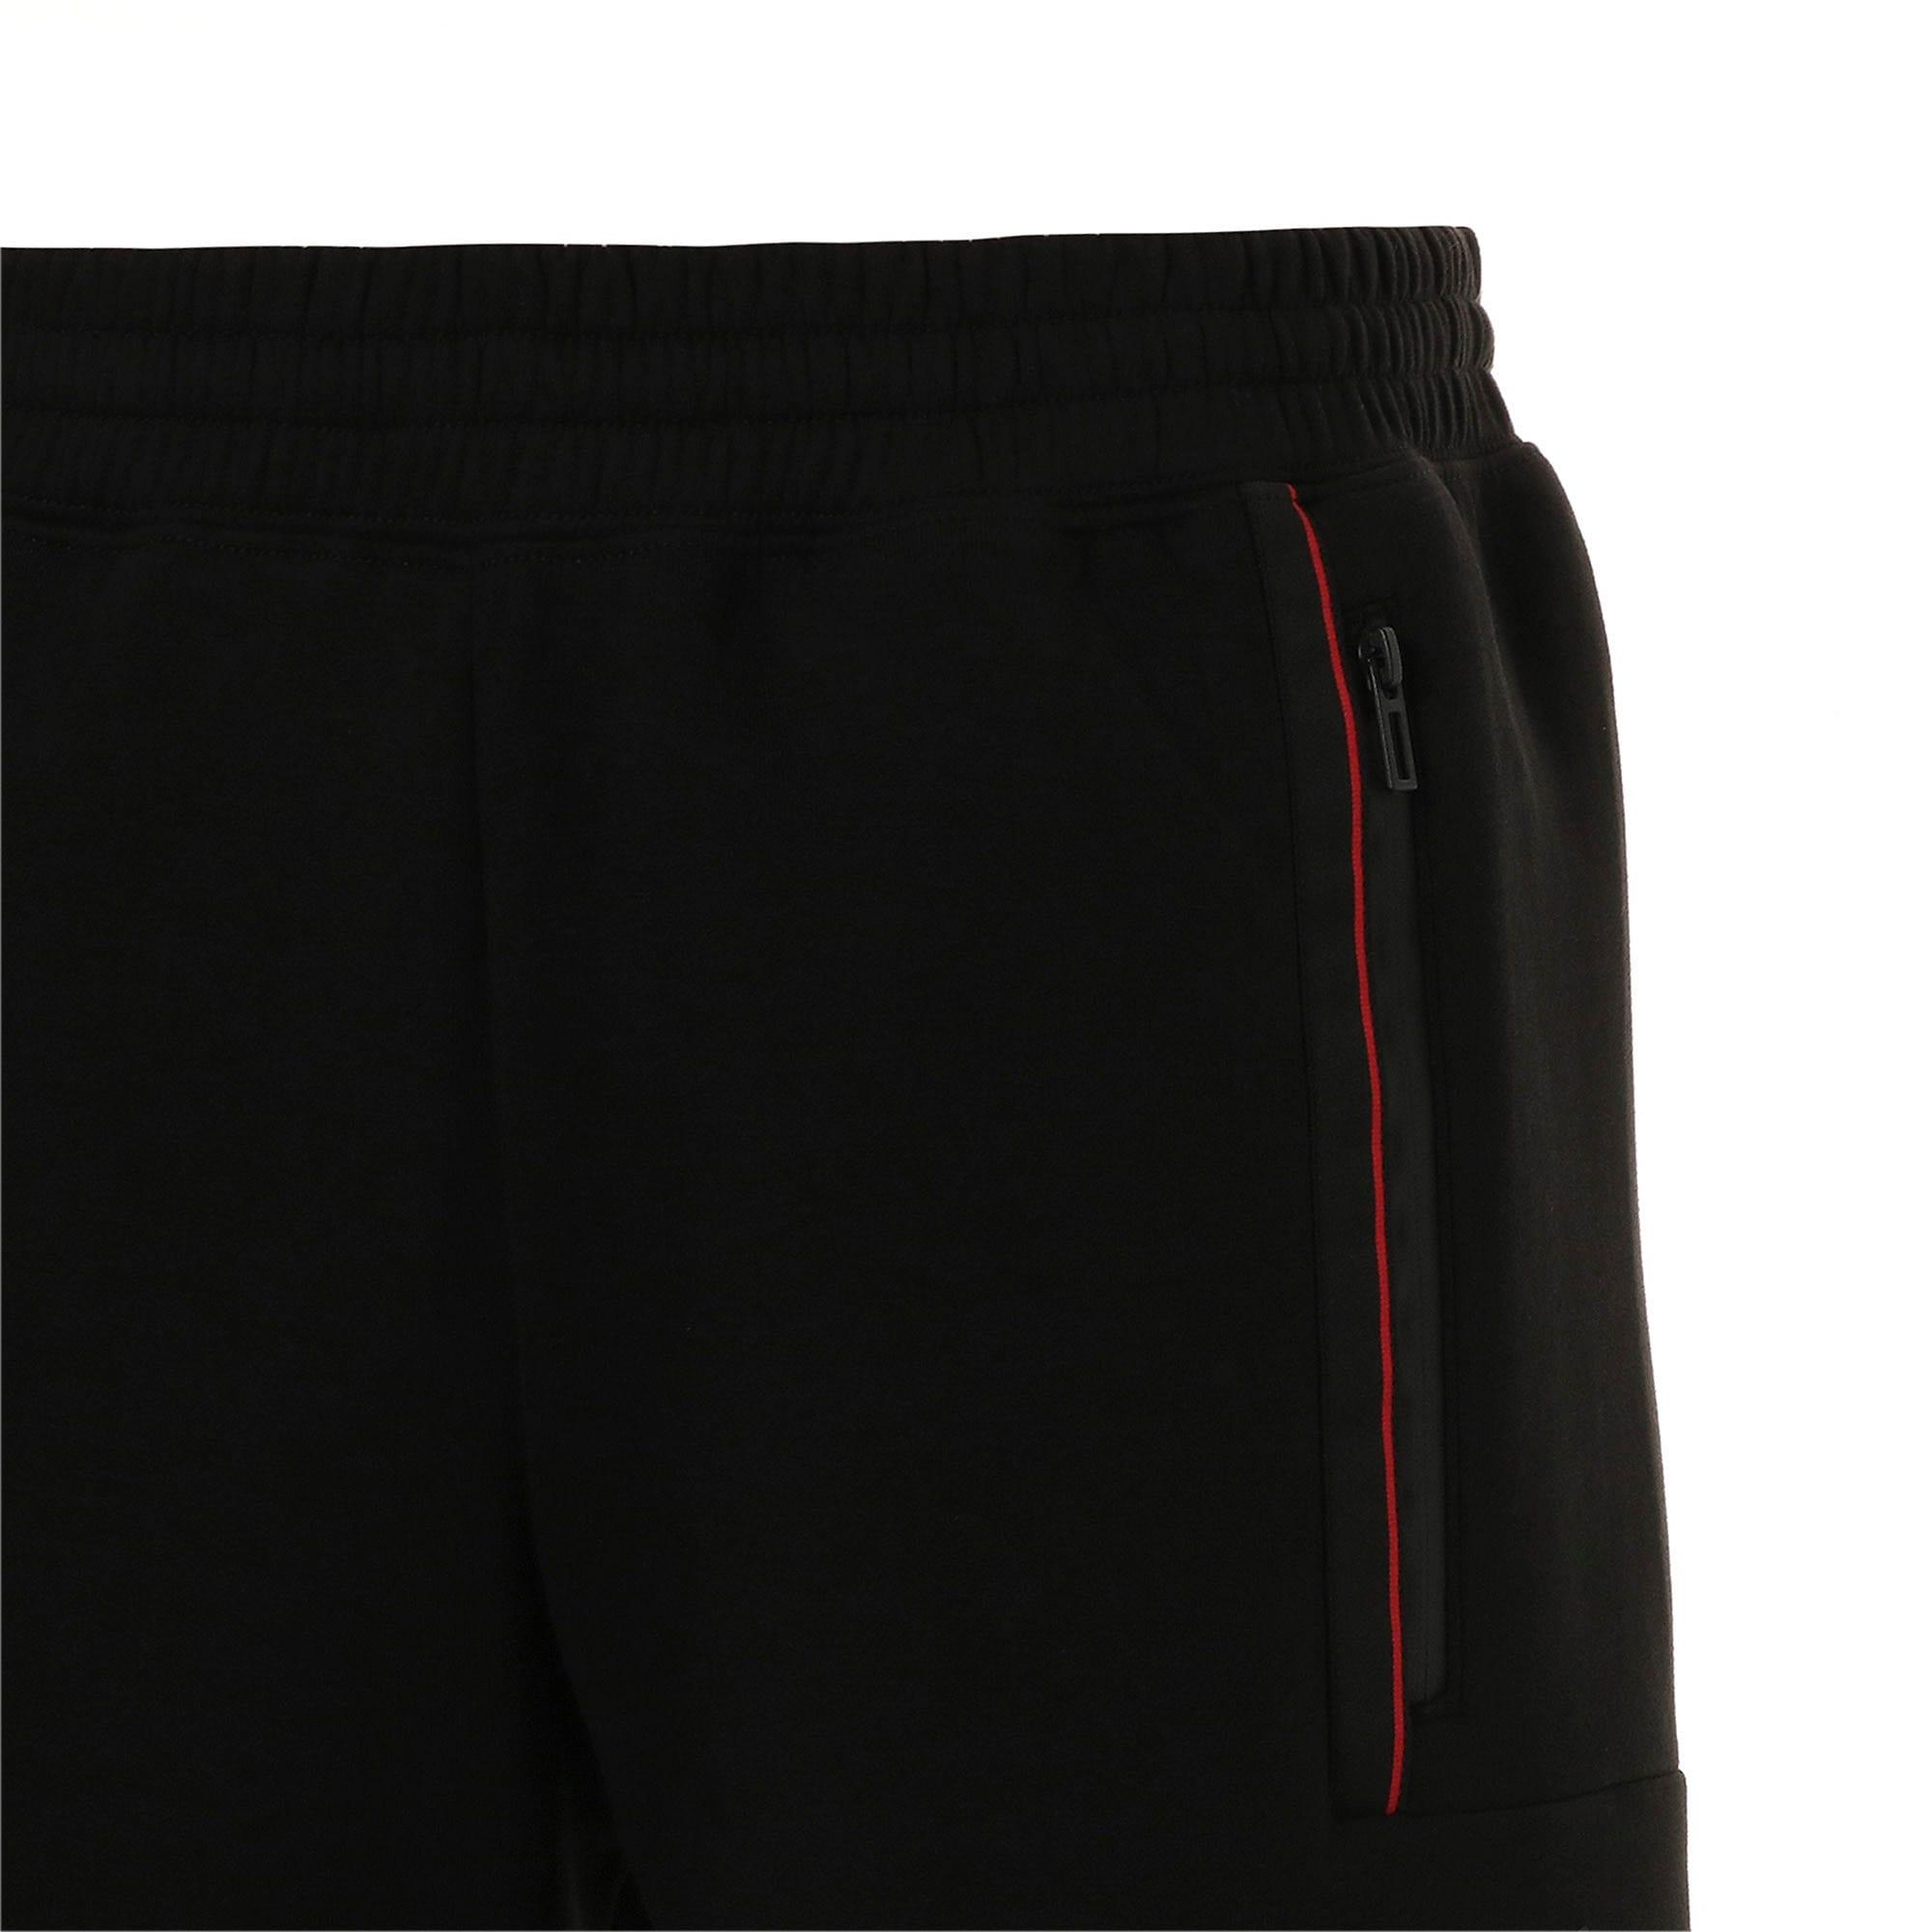 Thumbnail 5 of フェラーリ スウェット パンツ CC, Puma Black, medium-JPN